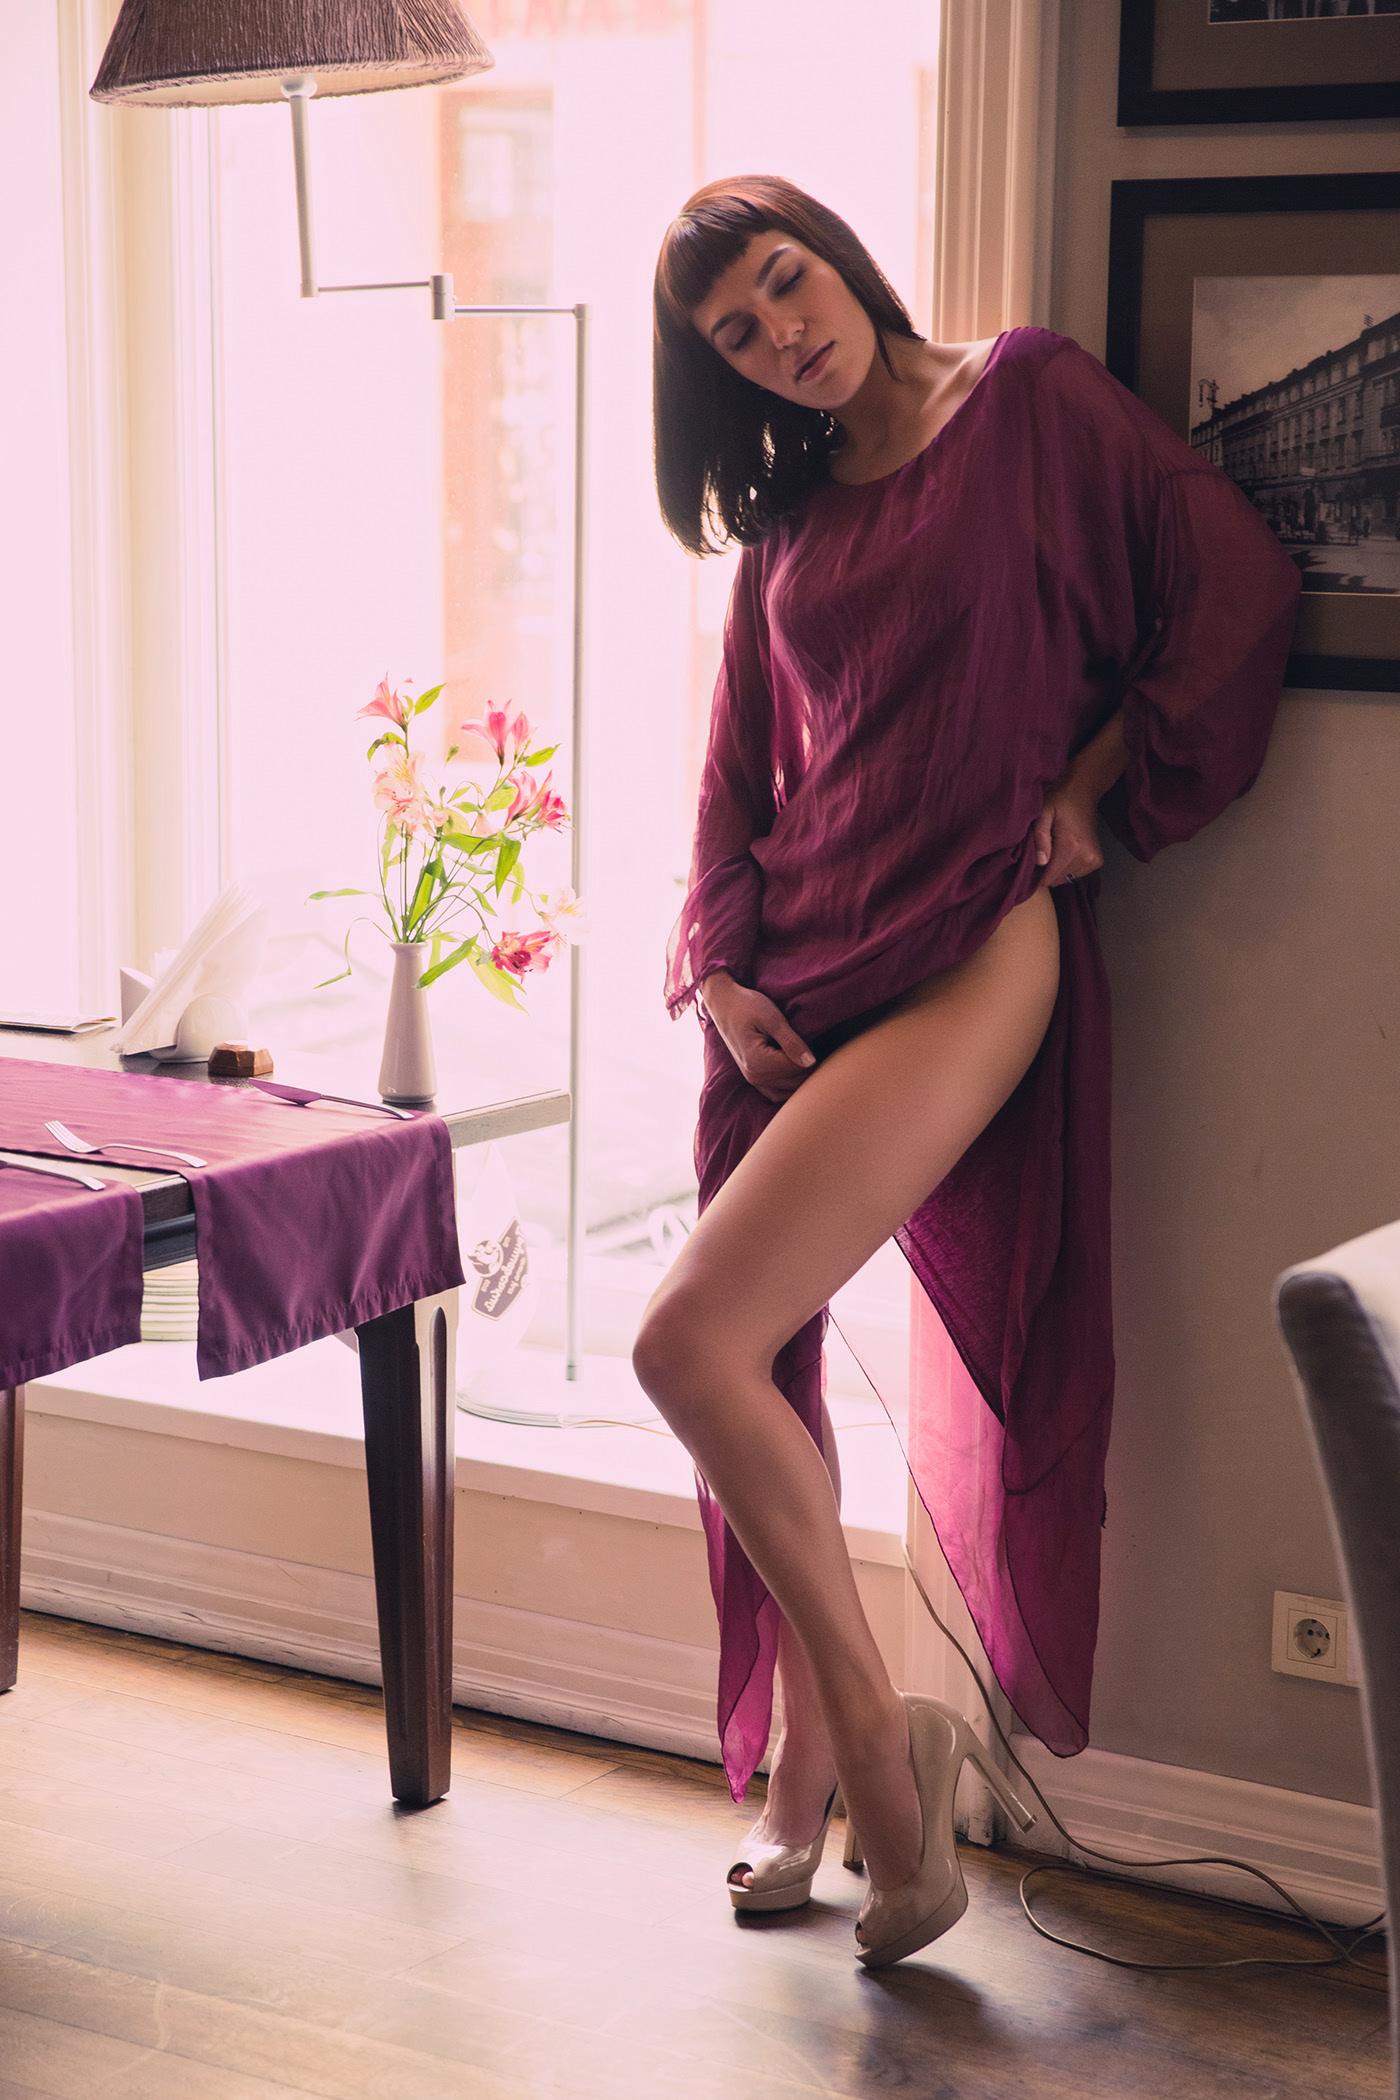 Good Morning / фотограф IvanovITCH